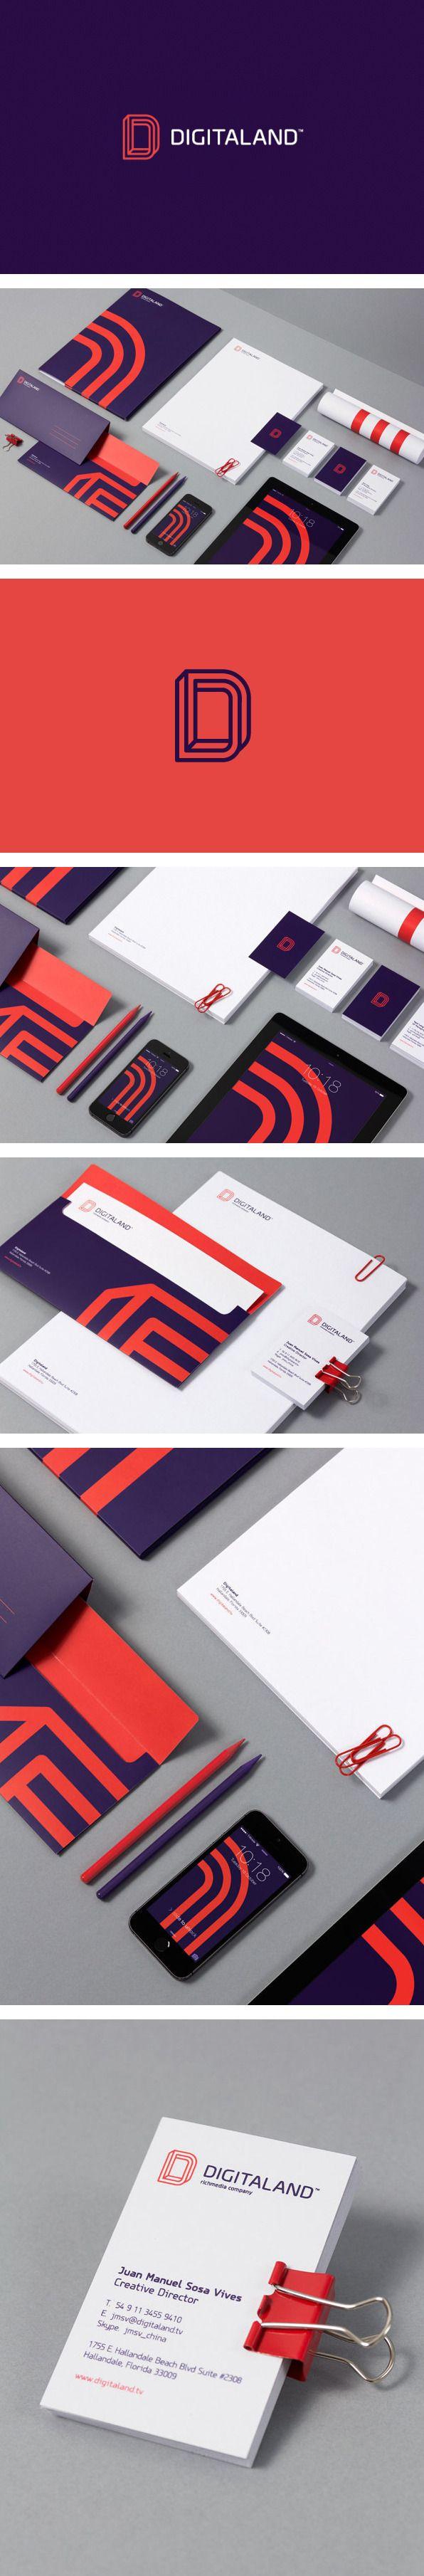 Digitaland logo/identity by for brands